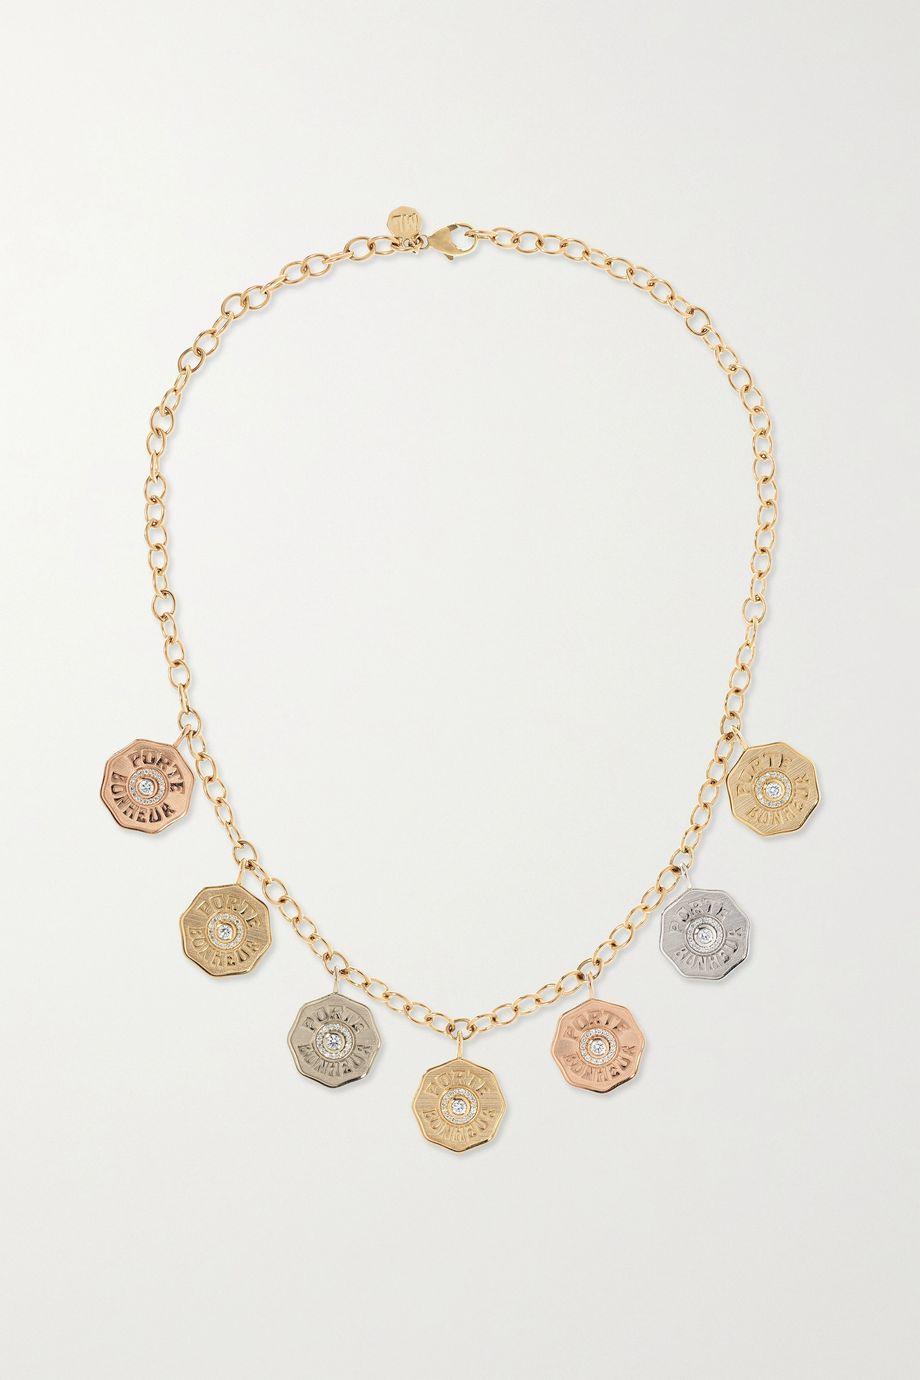 Marlo Laz Rhapsody 14-karat yellow, rose and white gold diamond necklace